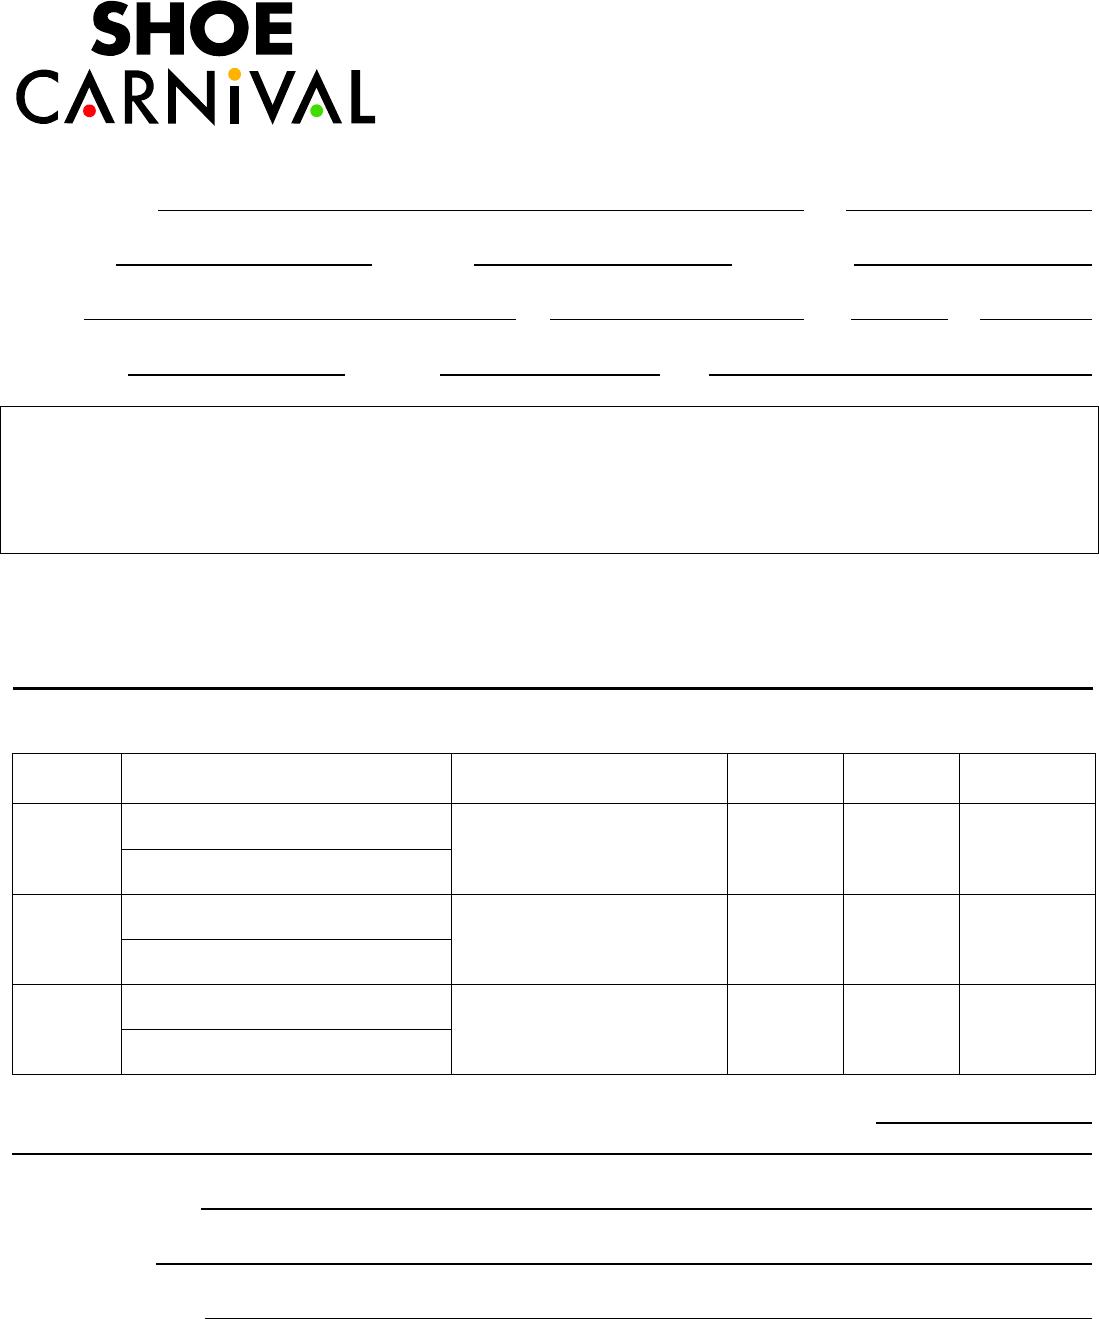 Free printable shoe carnival job application form falaconquin